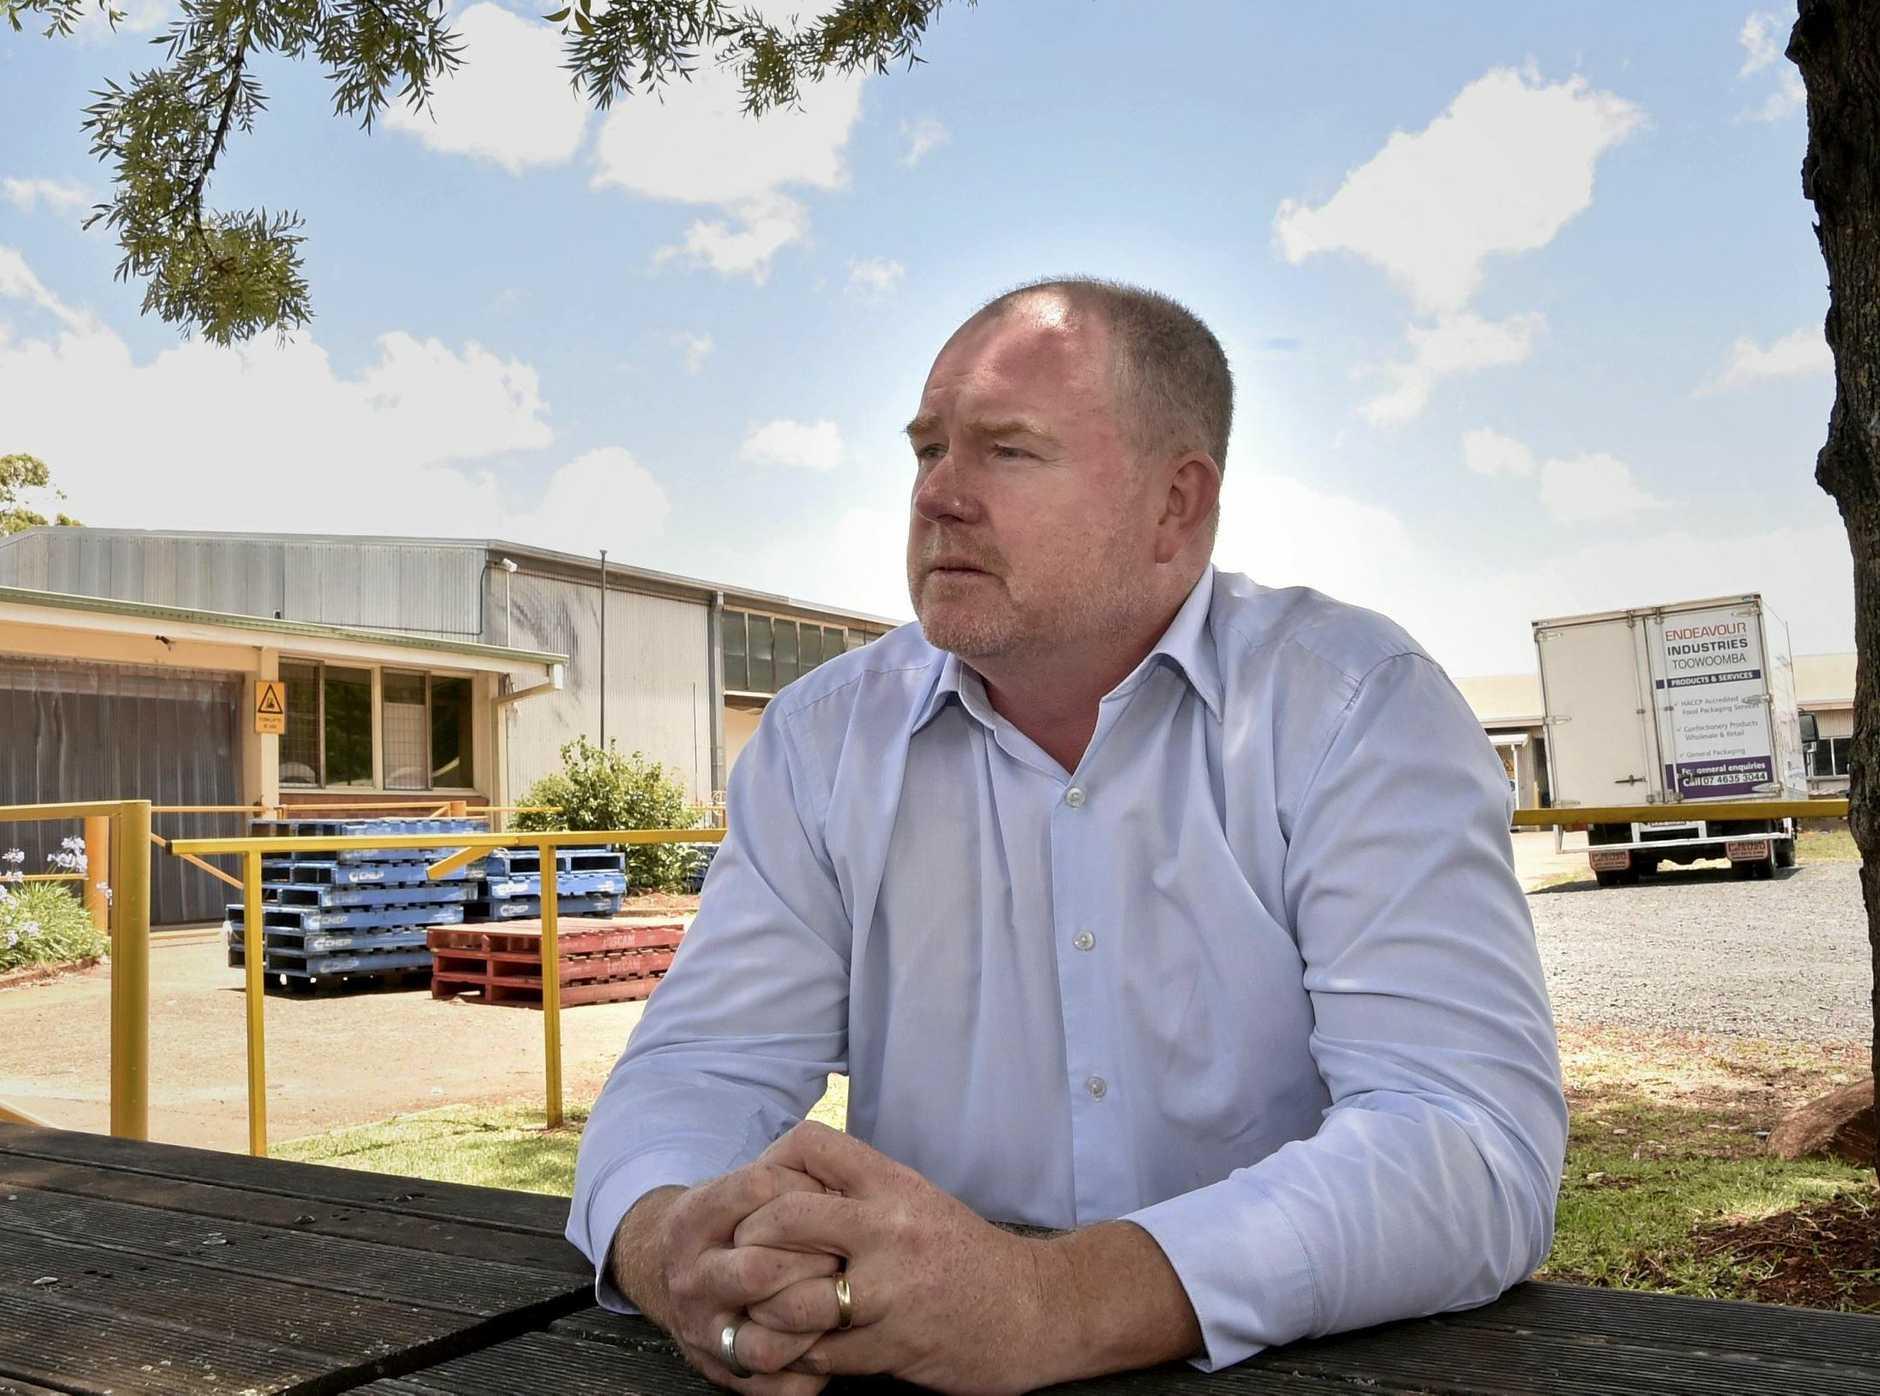 Endeavour Foundation general manager - service delivery Tony Vidler . Break in at Endeavour Foundation, Ramsay St. November 2017